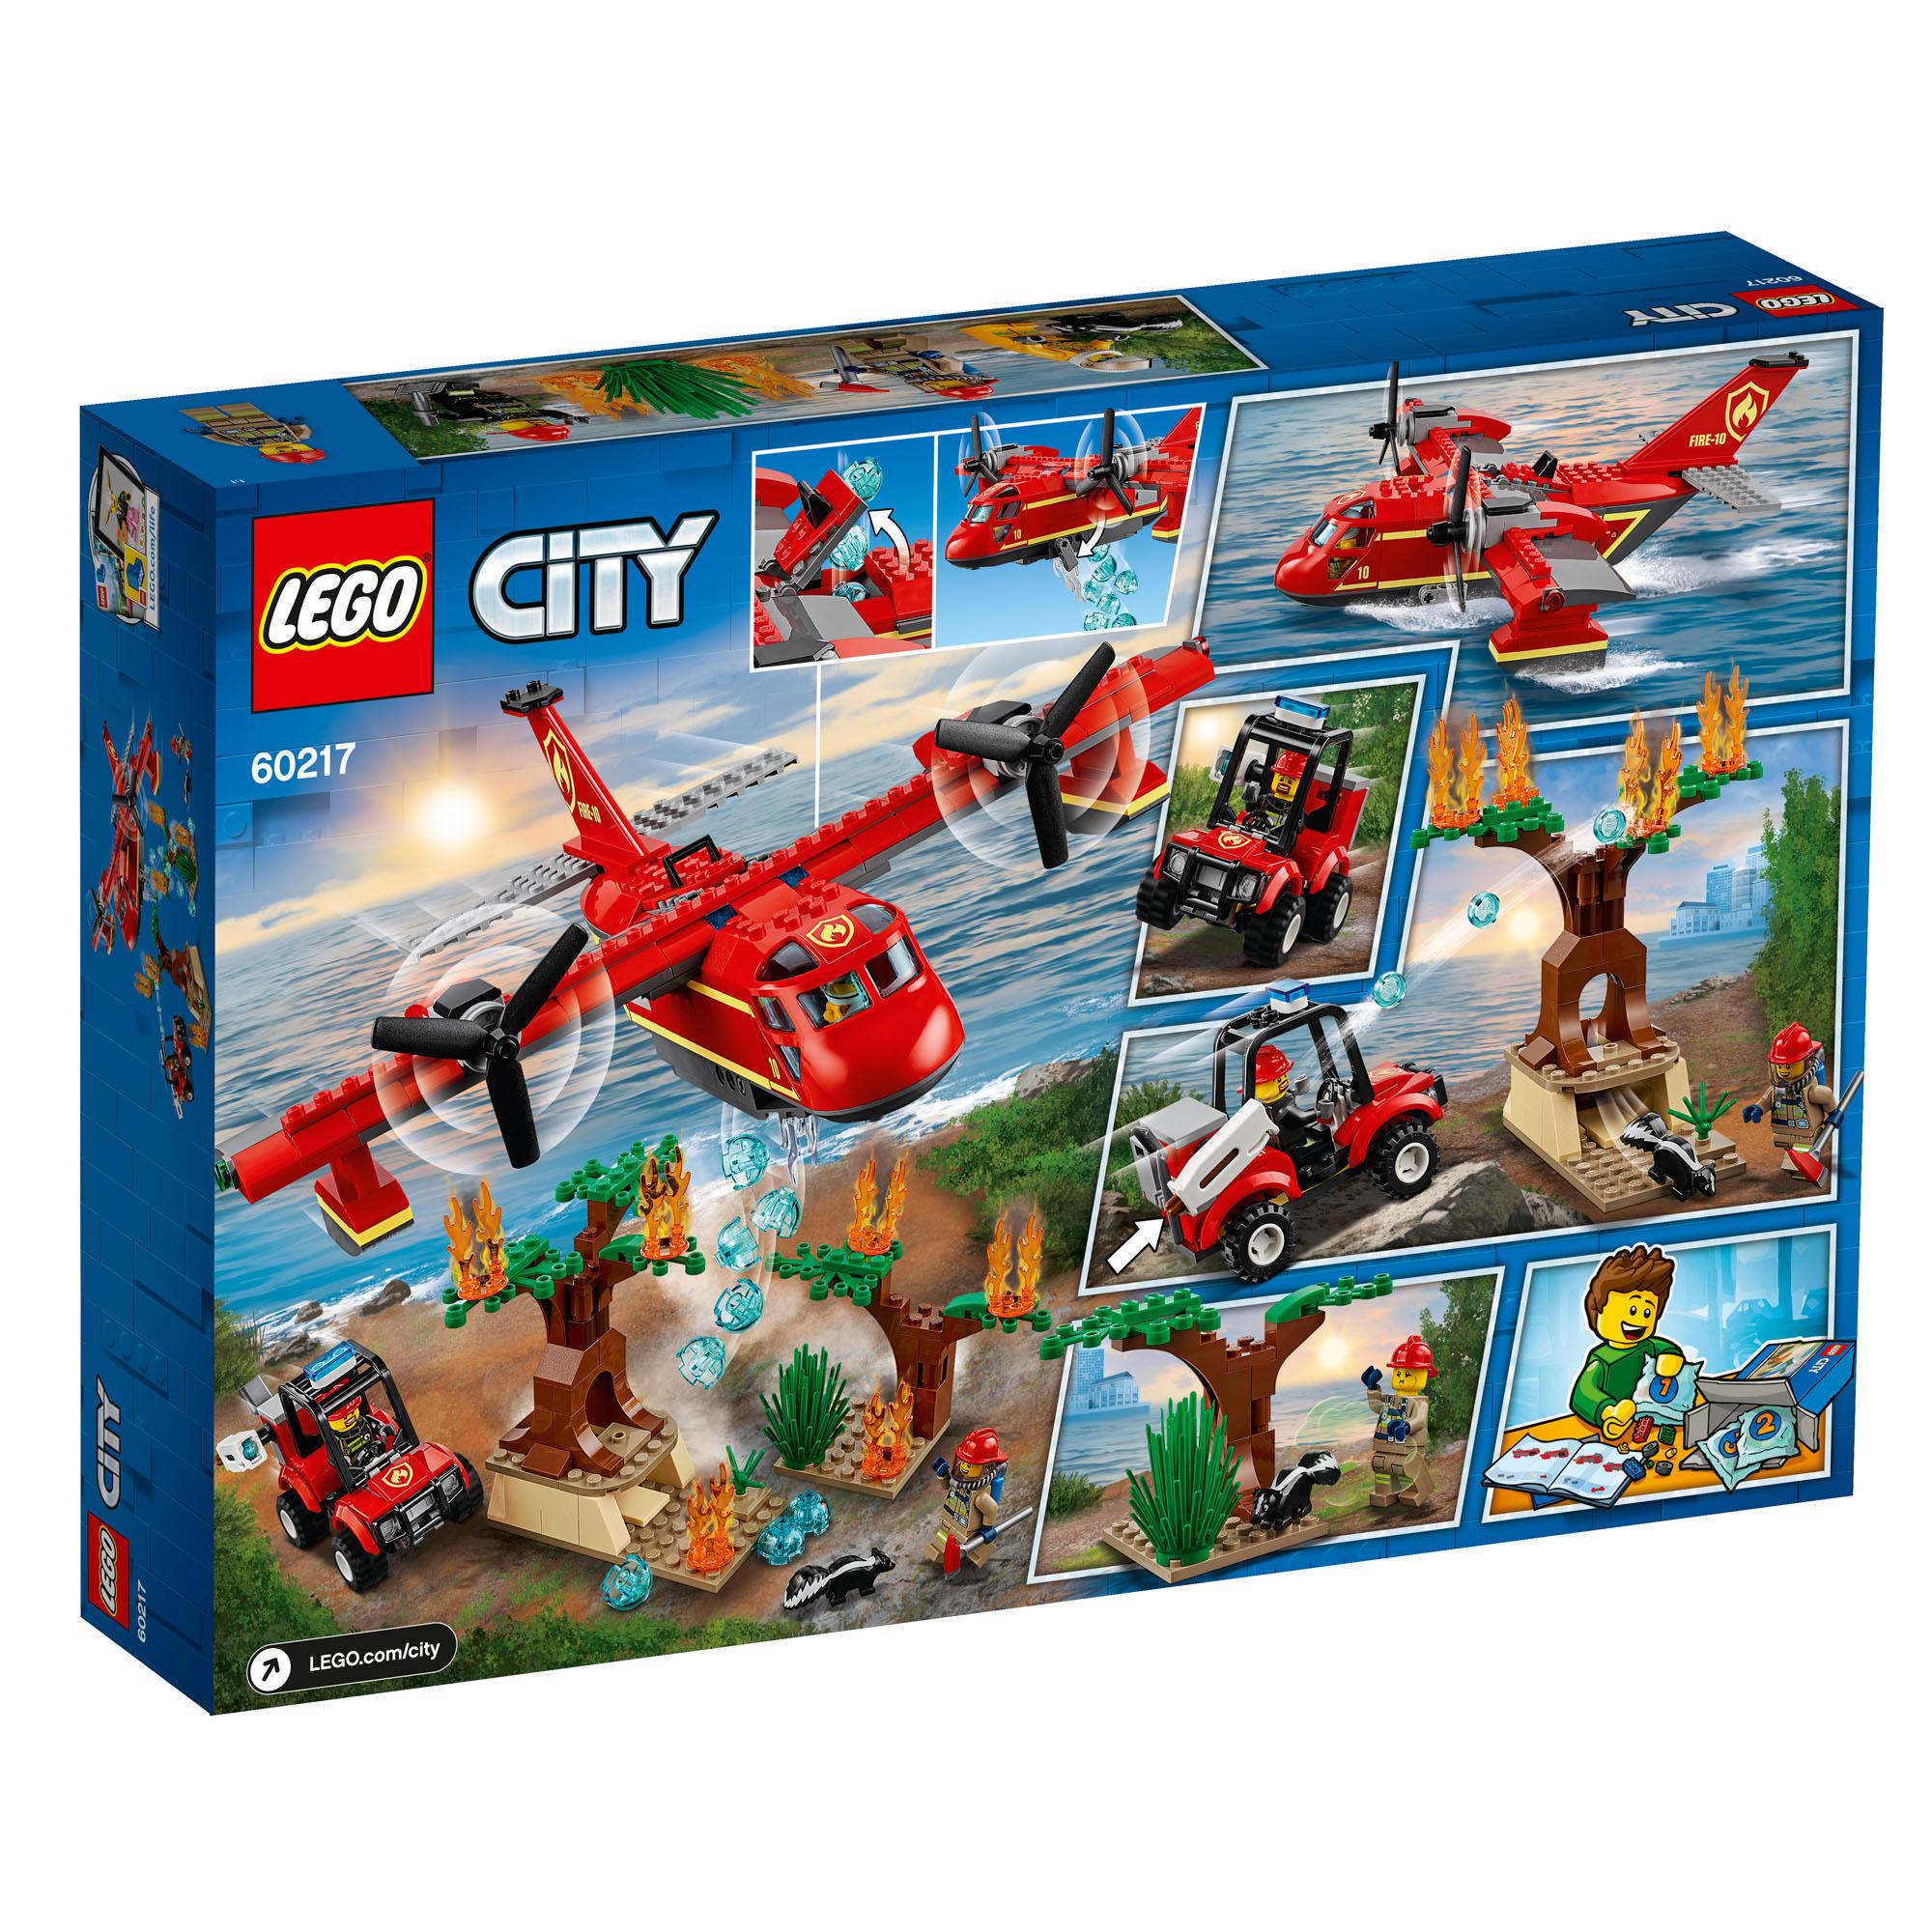 60217 LEGO CITY Fire Plane & Jeep Buggy Set 363 Pieces Age ...